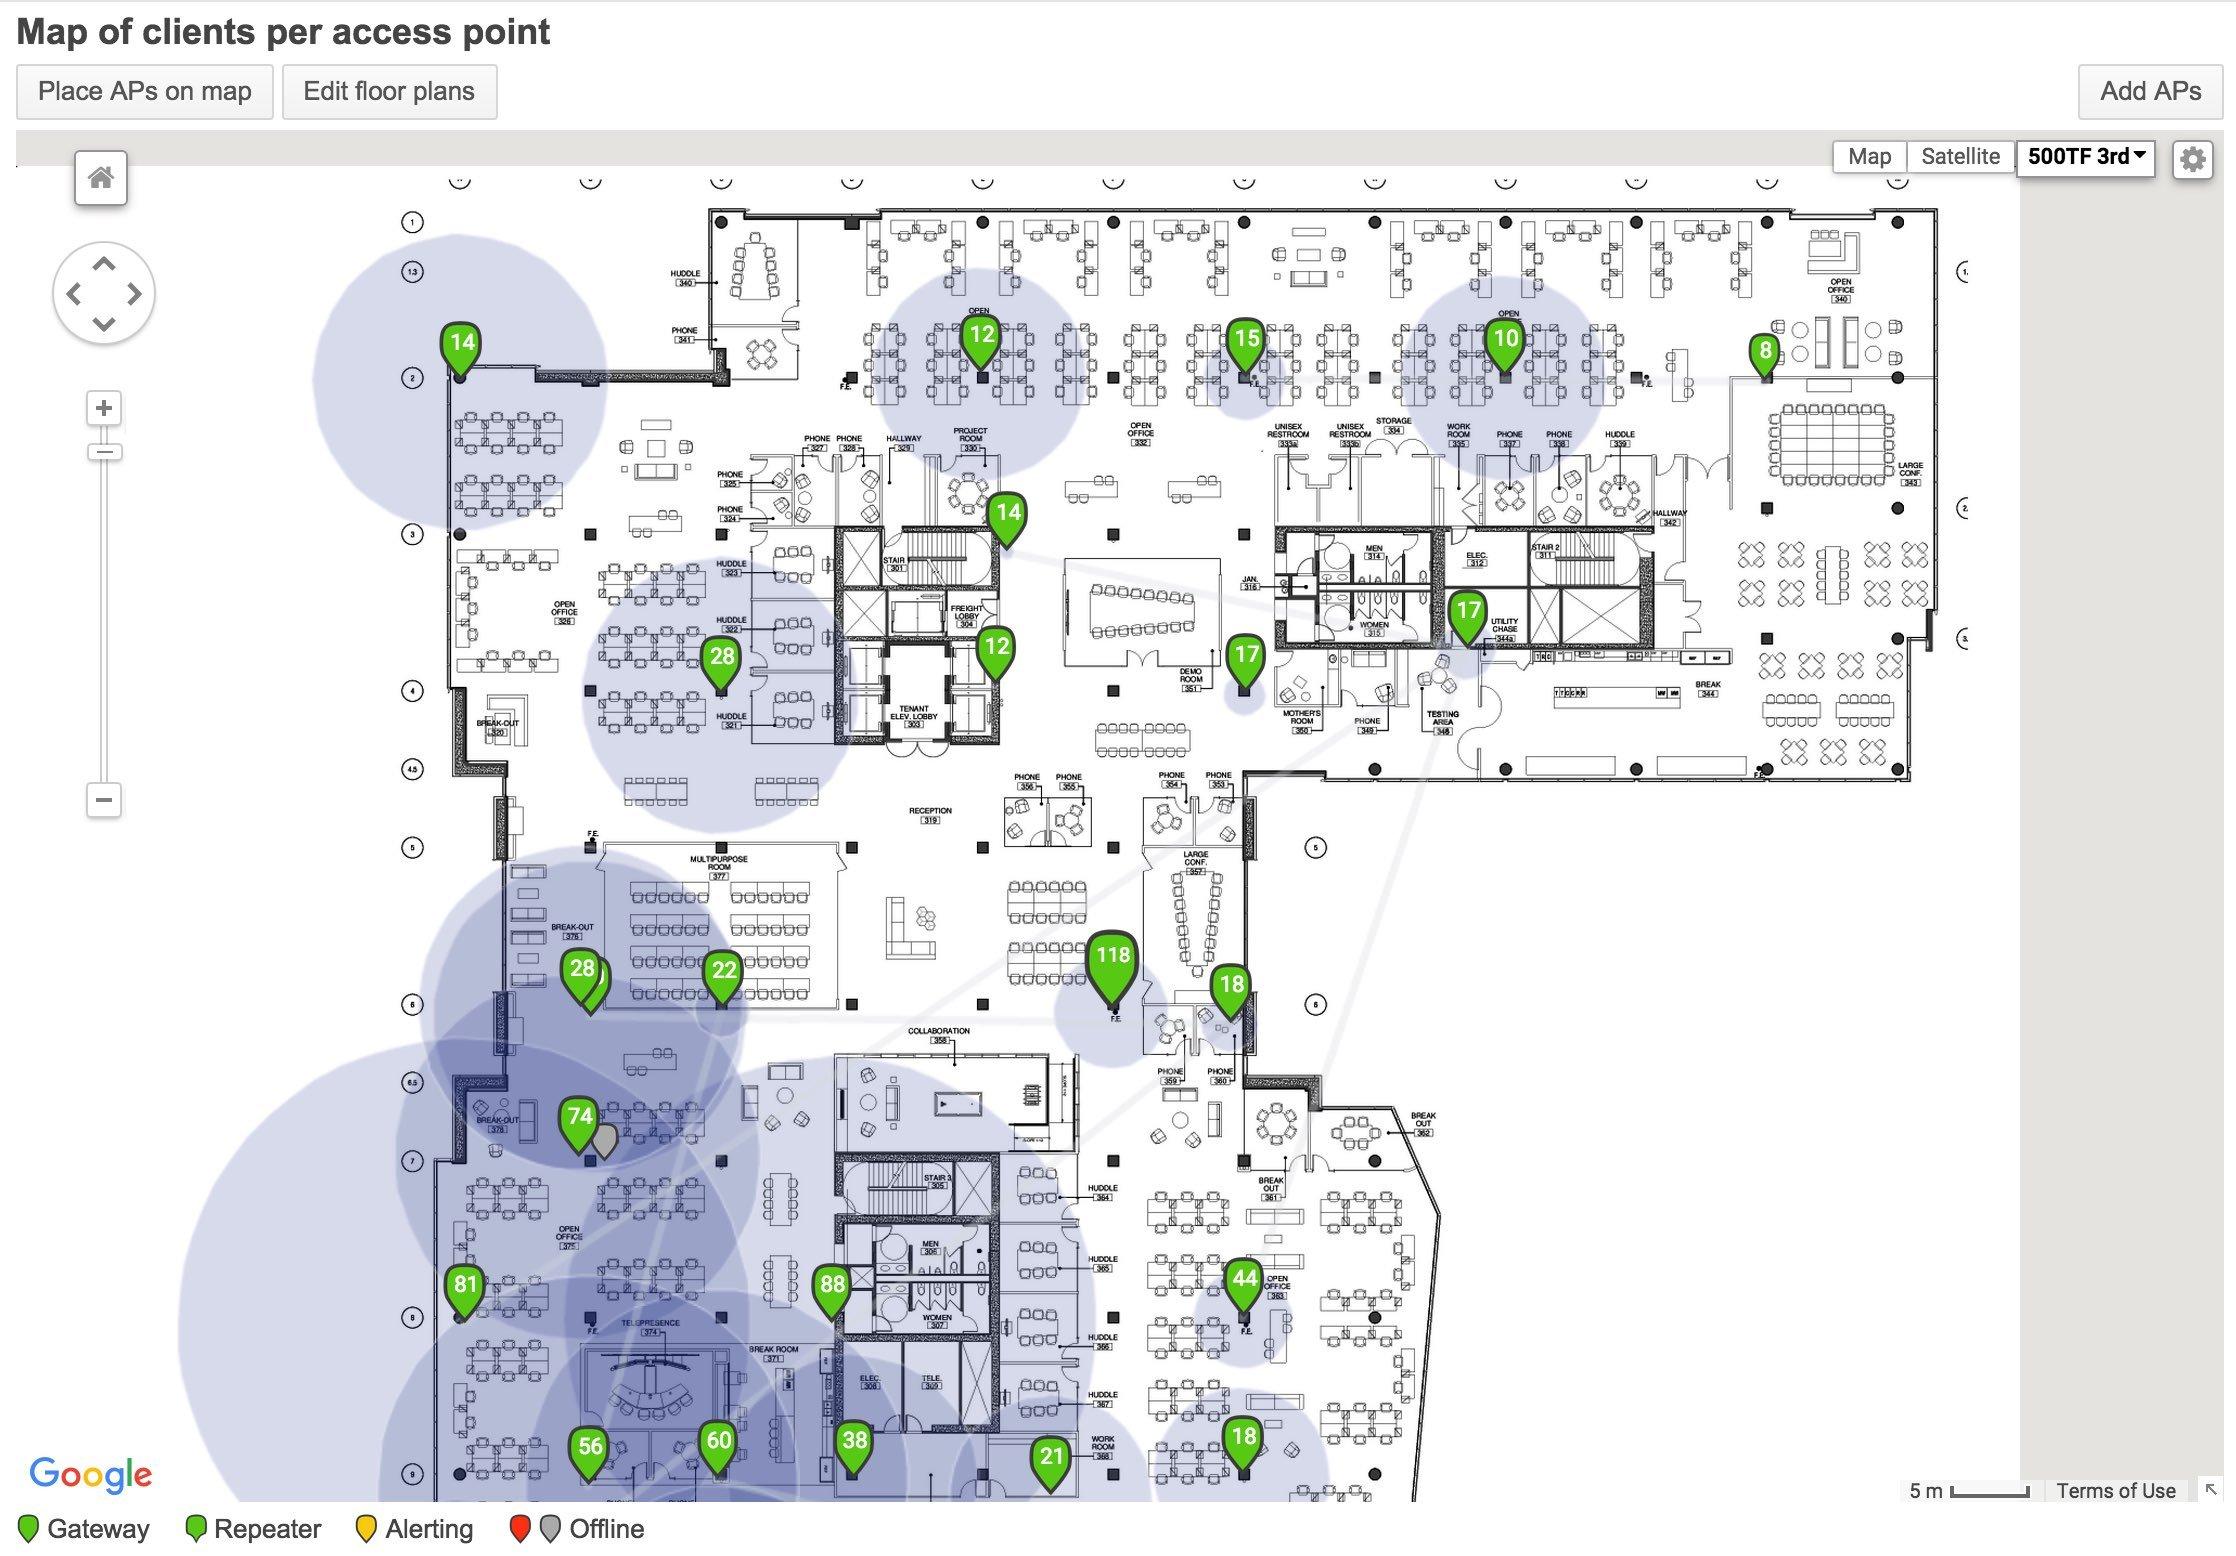 Cisco Meraki MAP of access points